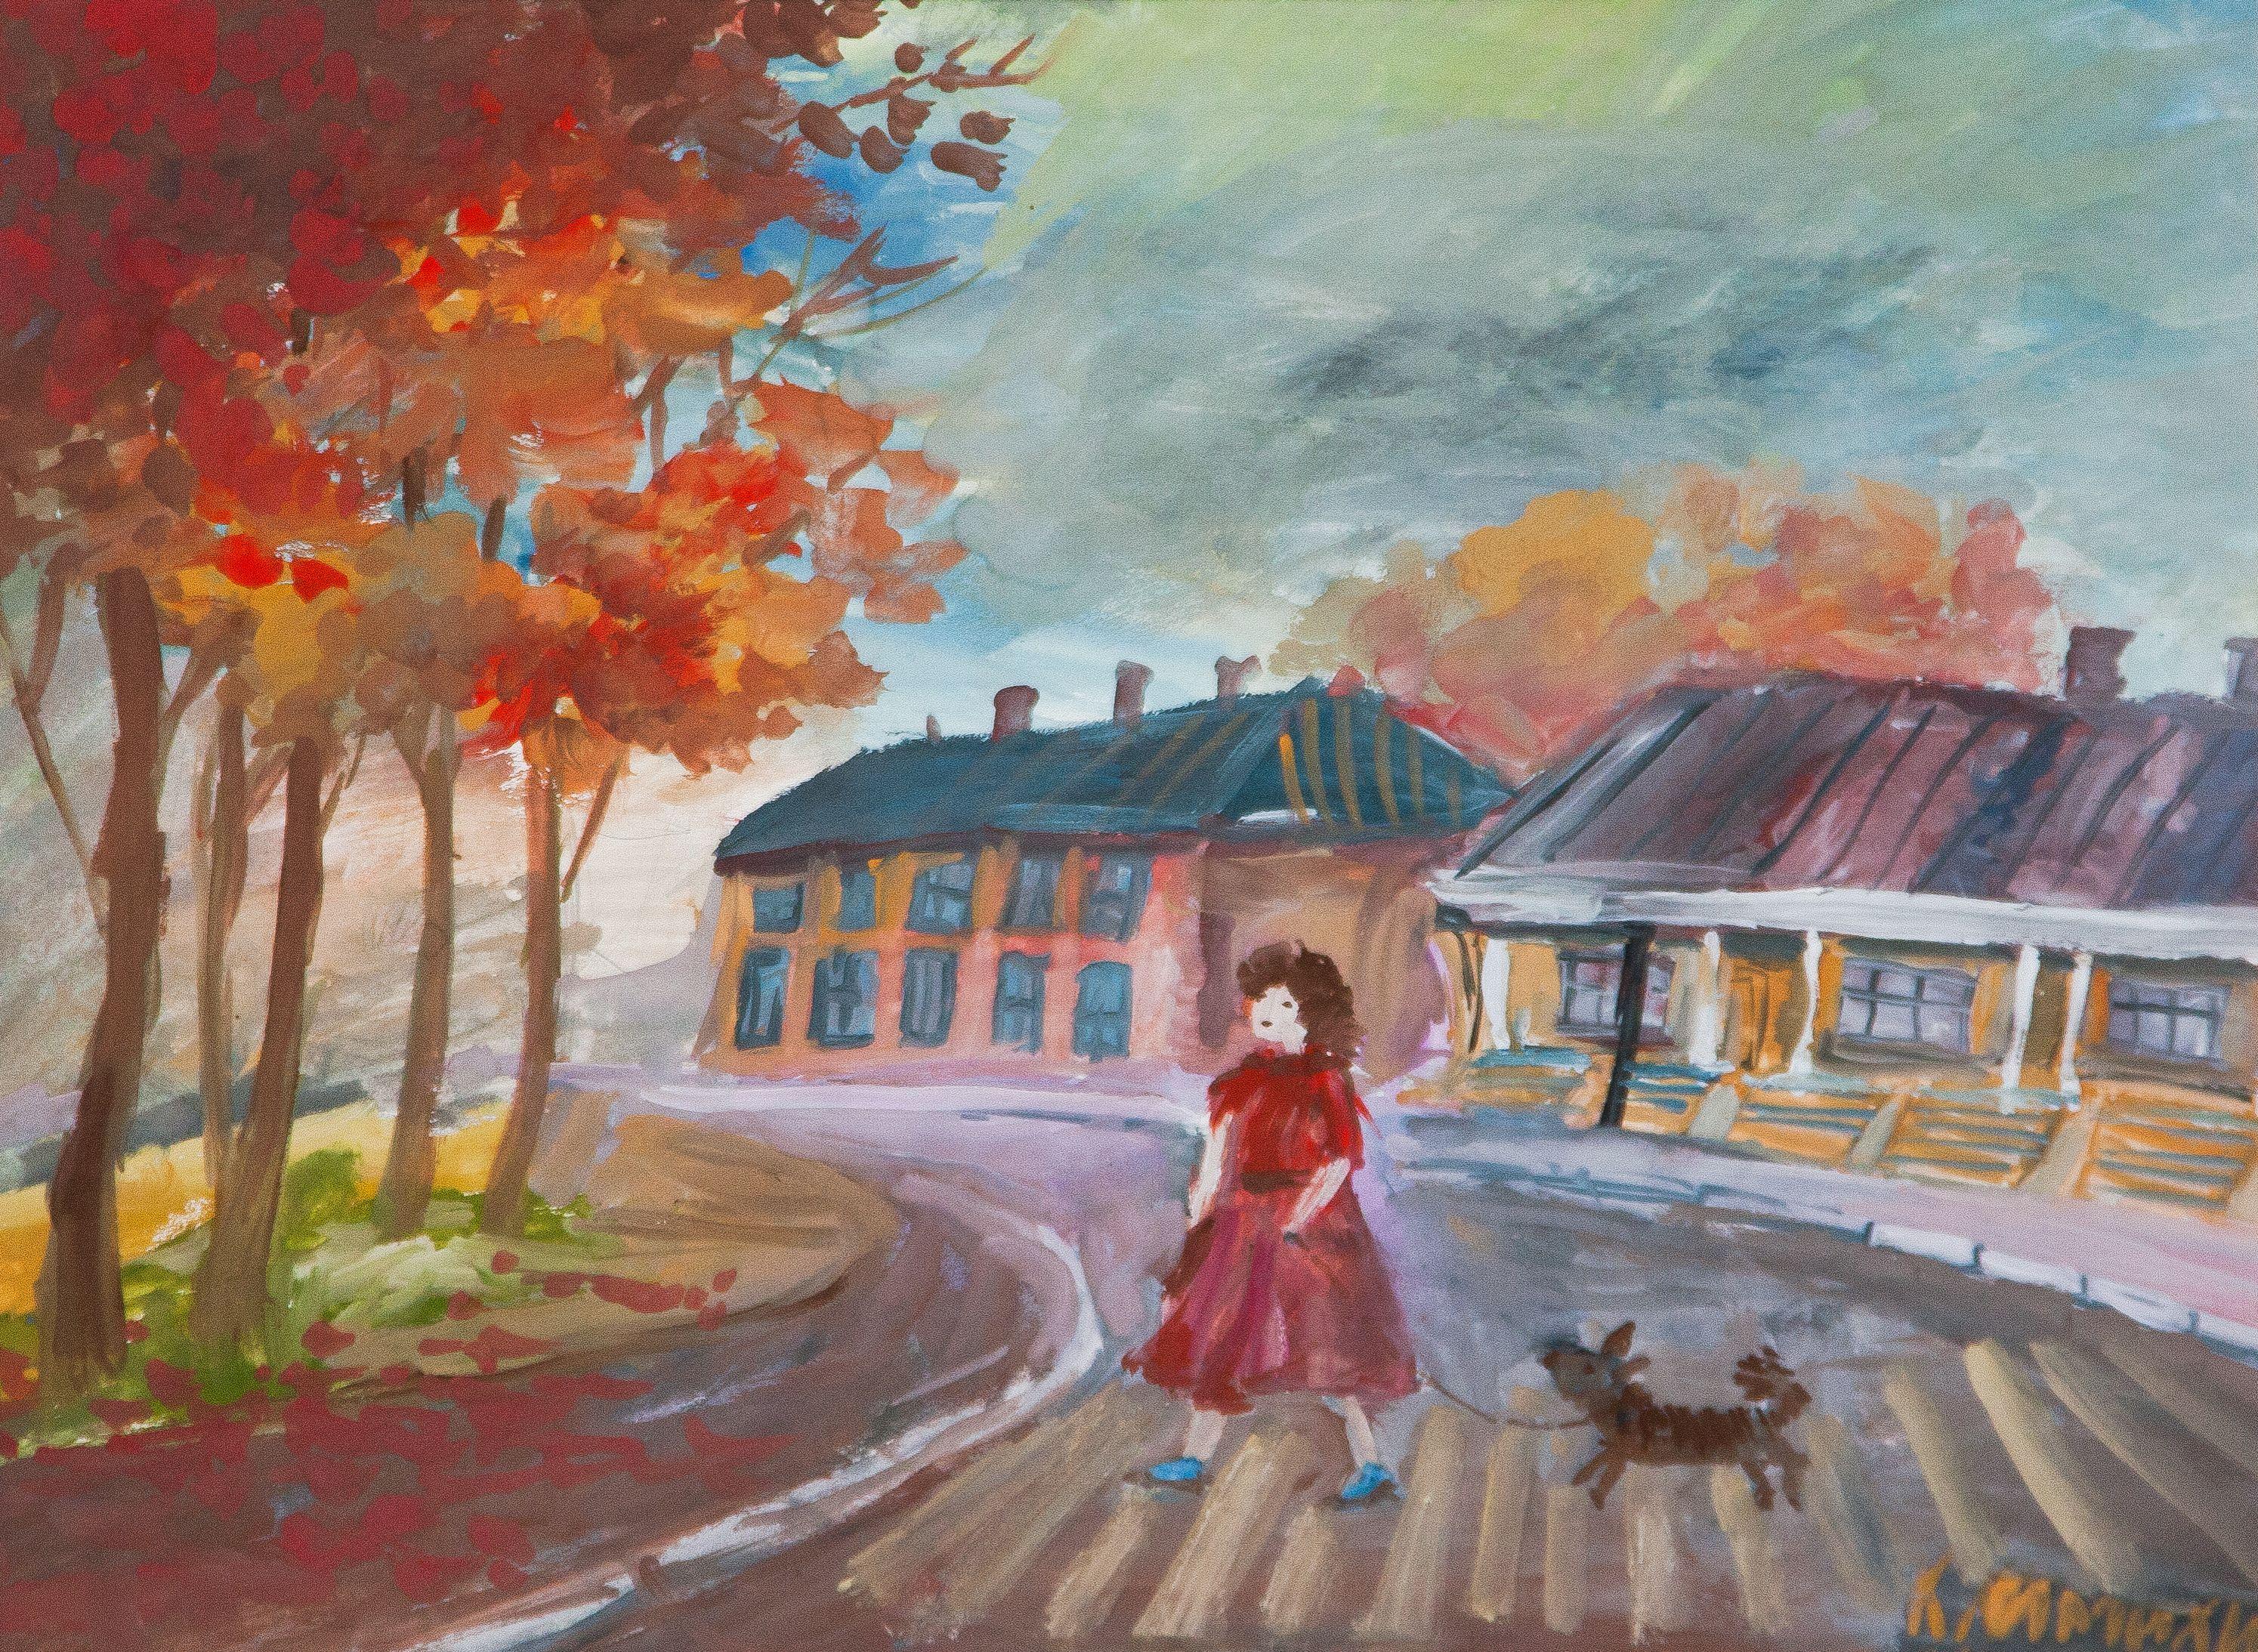 """Осенняя прогулка"", Климихина Милена (11 лет), преп. О. Д. Гоголева"